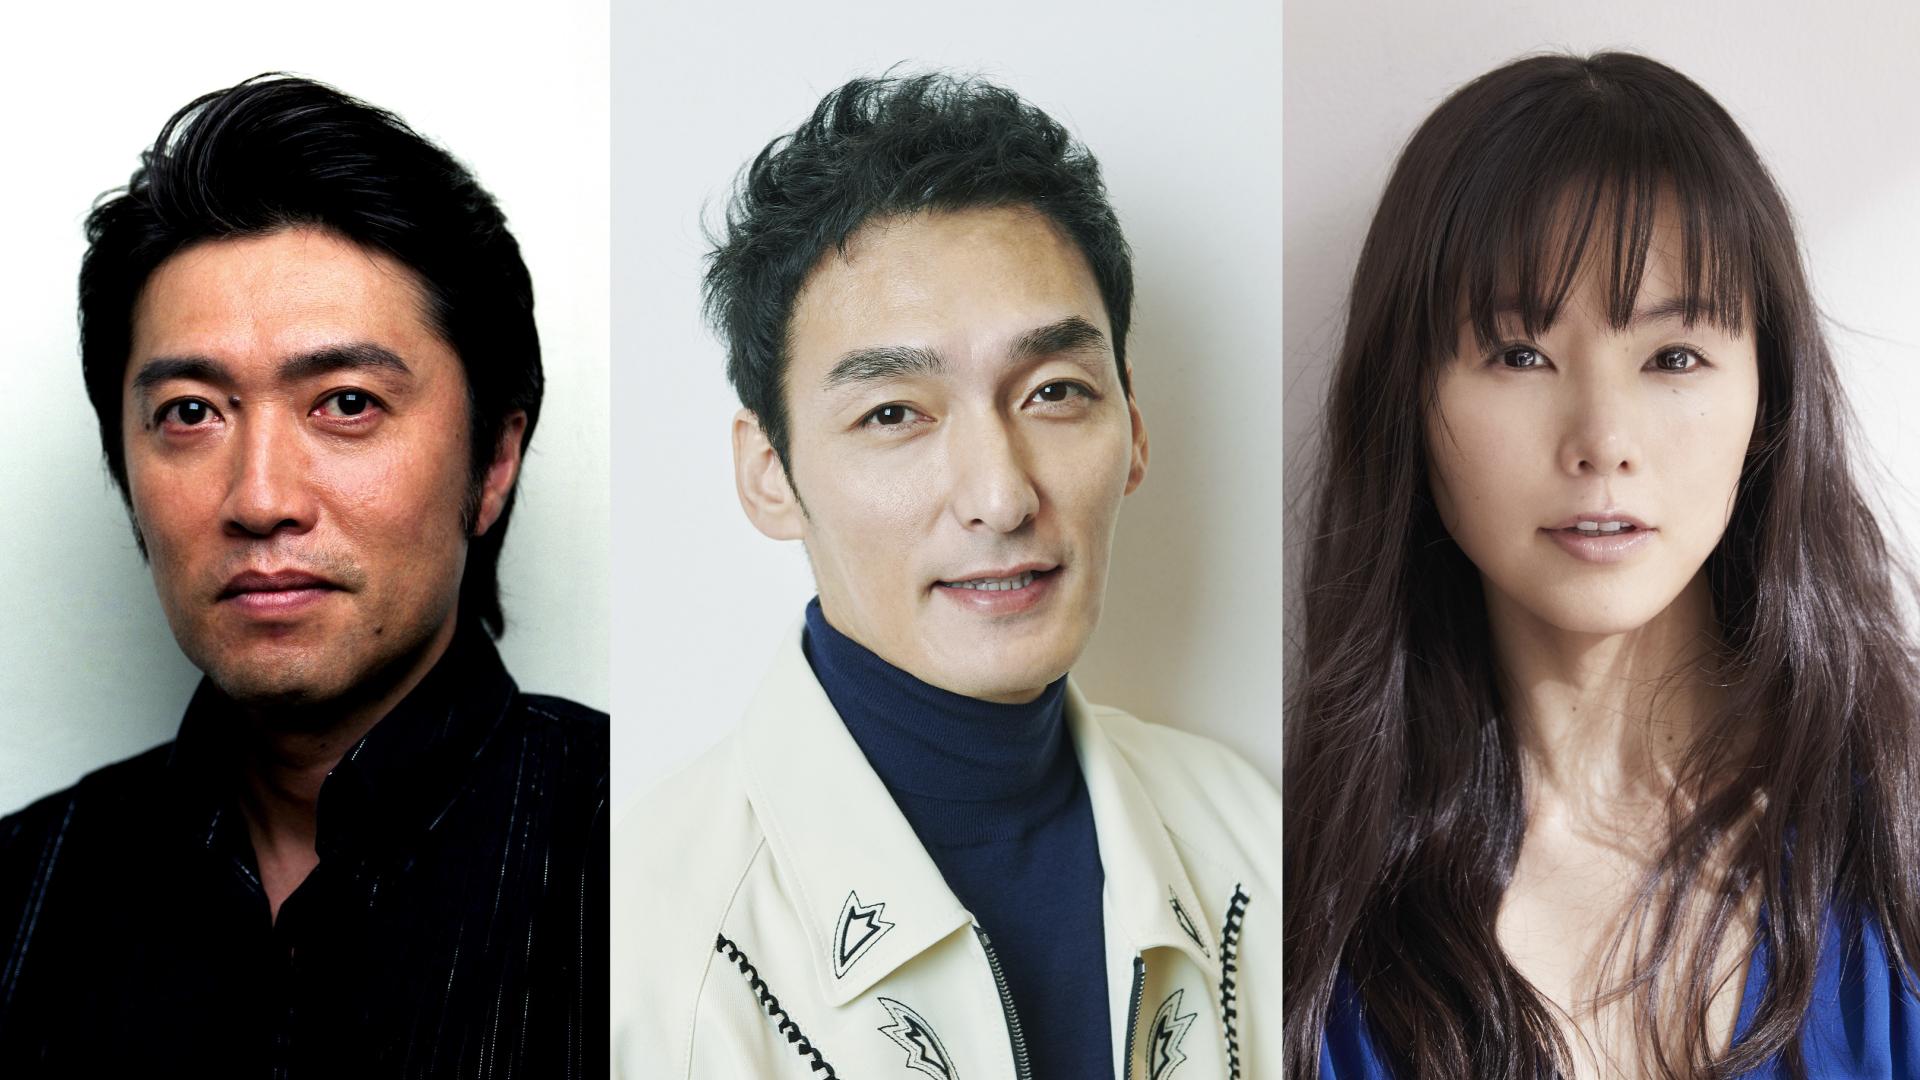 (左から)池田成志、草彅剛、小西真奈美